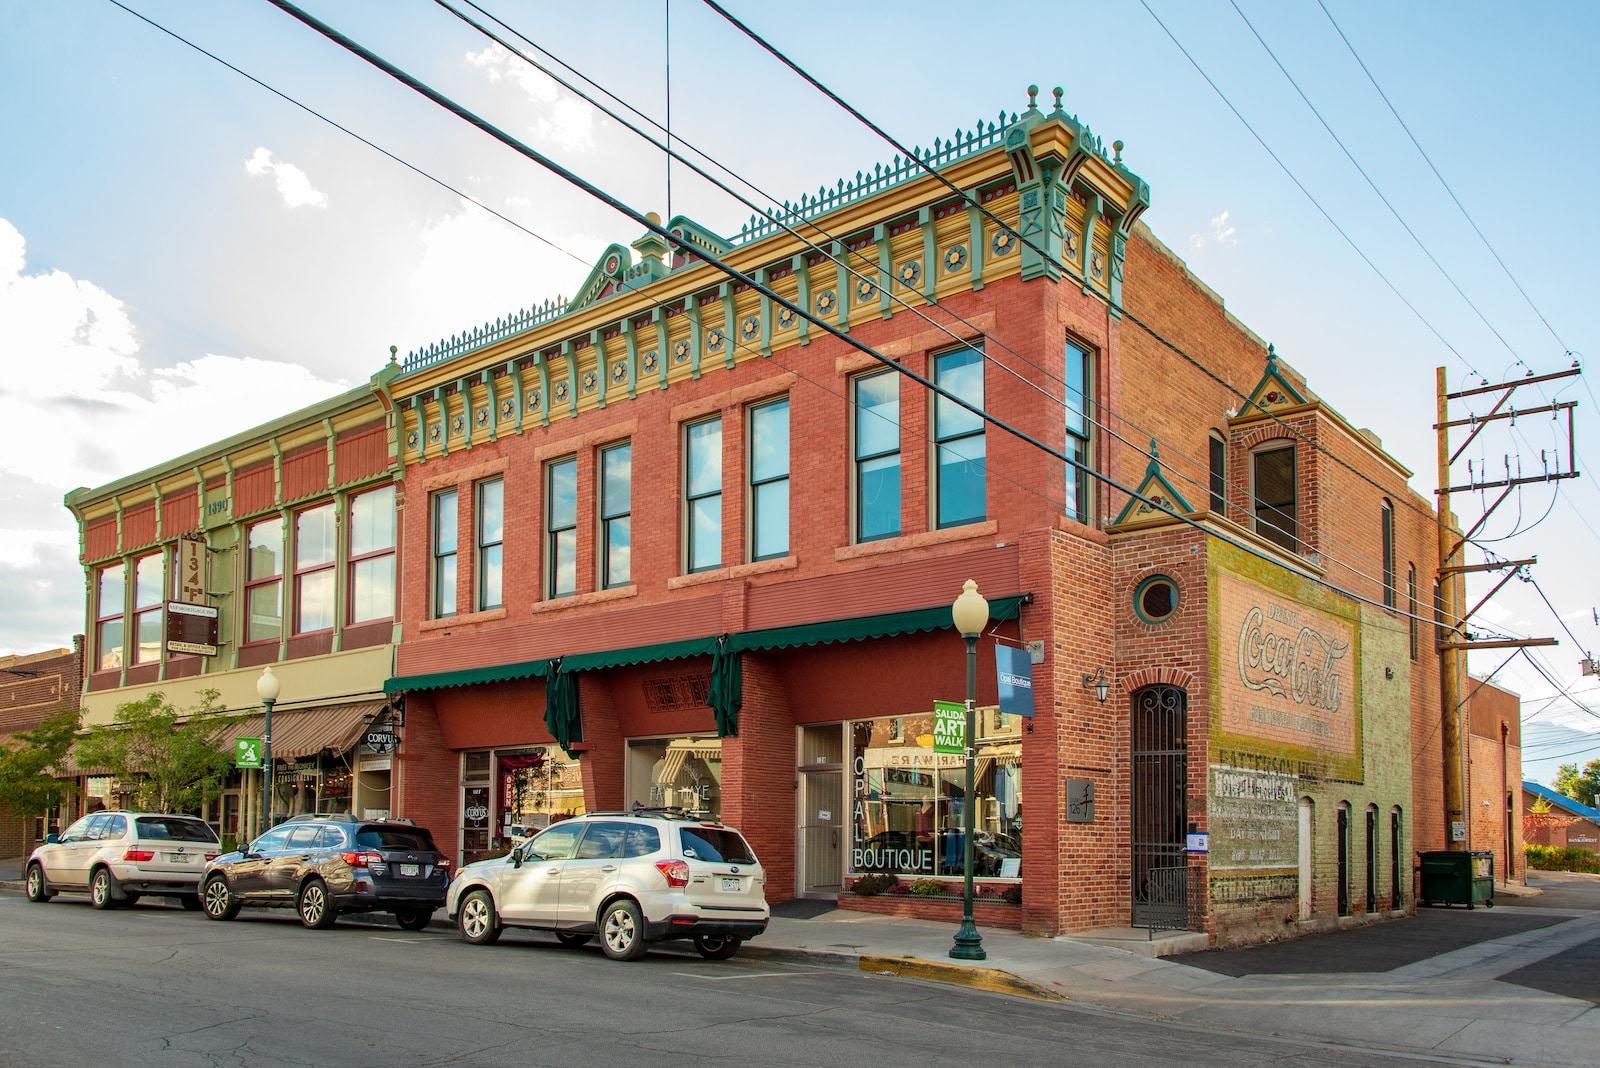 Historic downtown Salida